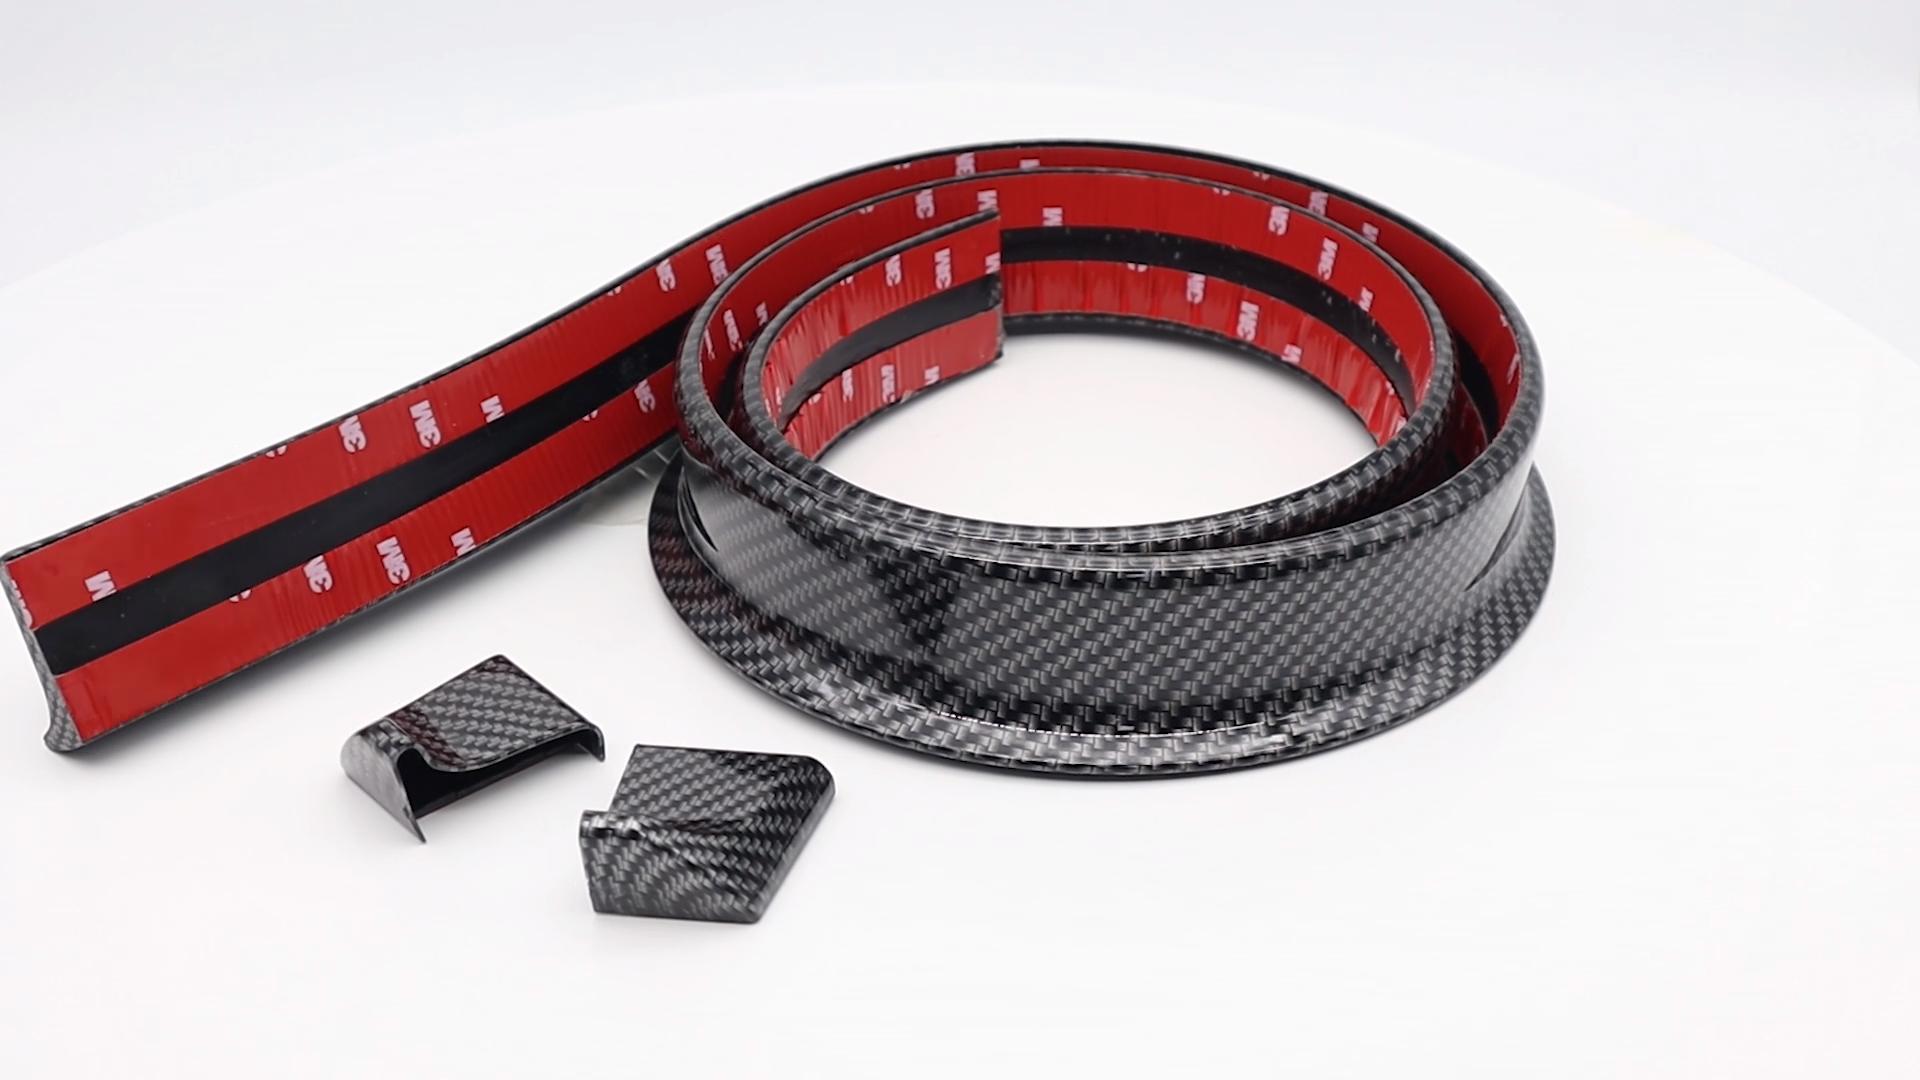 Universal Carbon Fiber Texture 3.2x150cm Racing Car Rear Automotive Spoiler DIY Trunk Rear Roof Lip Ducktail Wing Spoiler